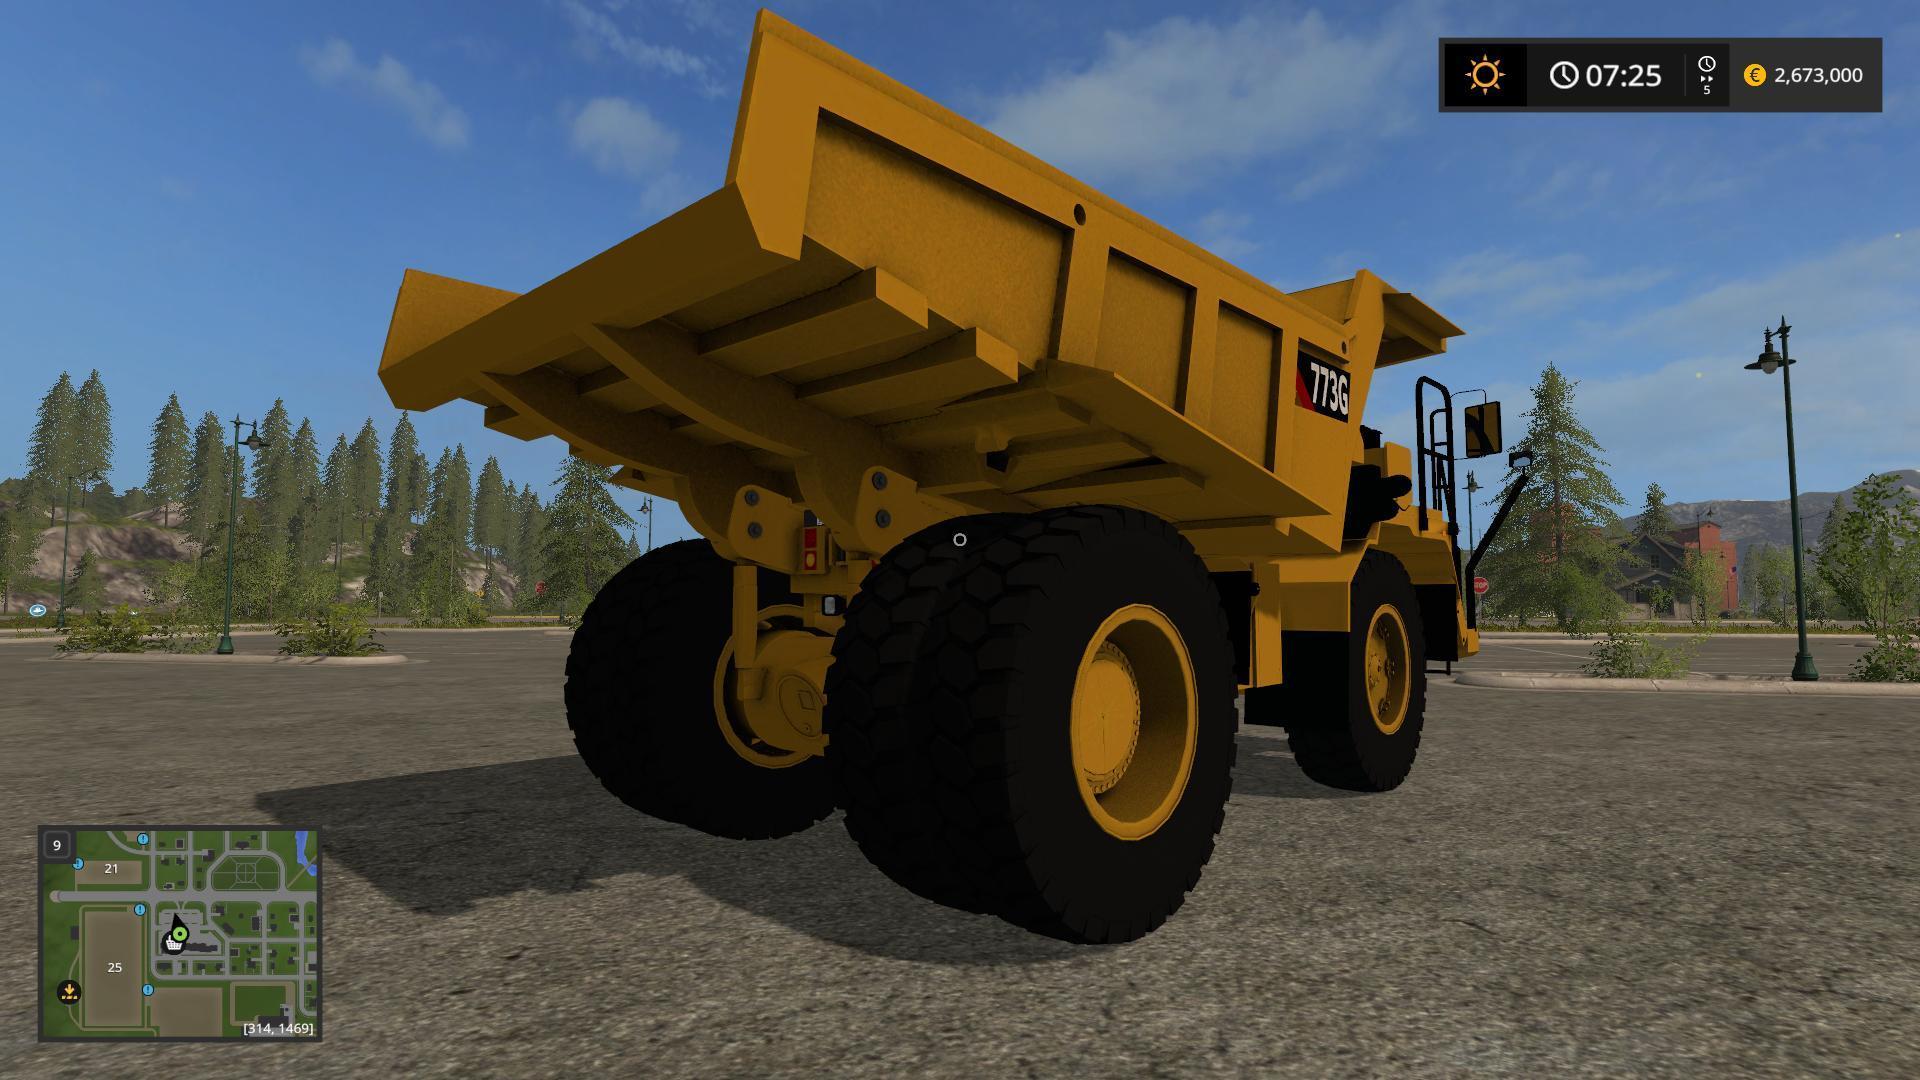 CAT 773G V1.3 for FS 17 - Farming Simulator 2017 mod, LS 2017 mod / FS 17 mod